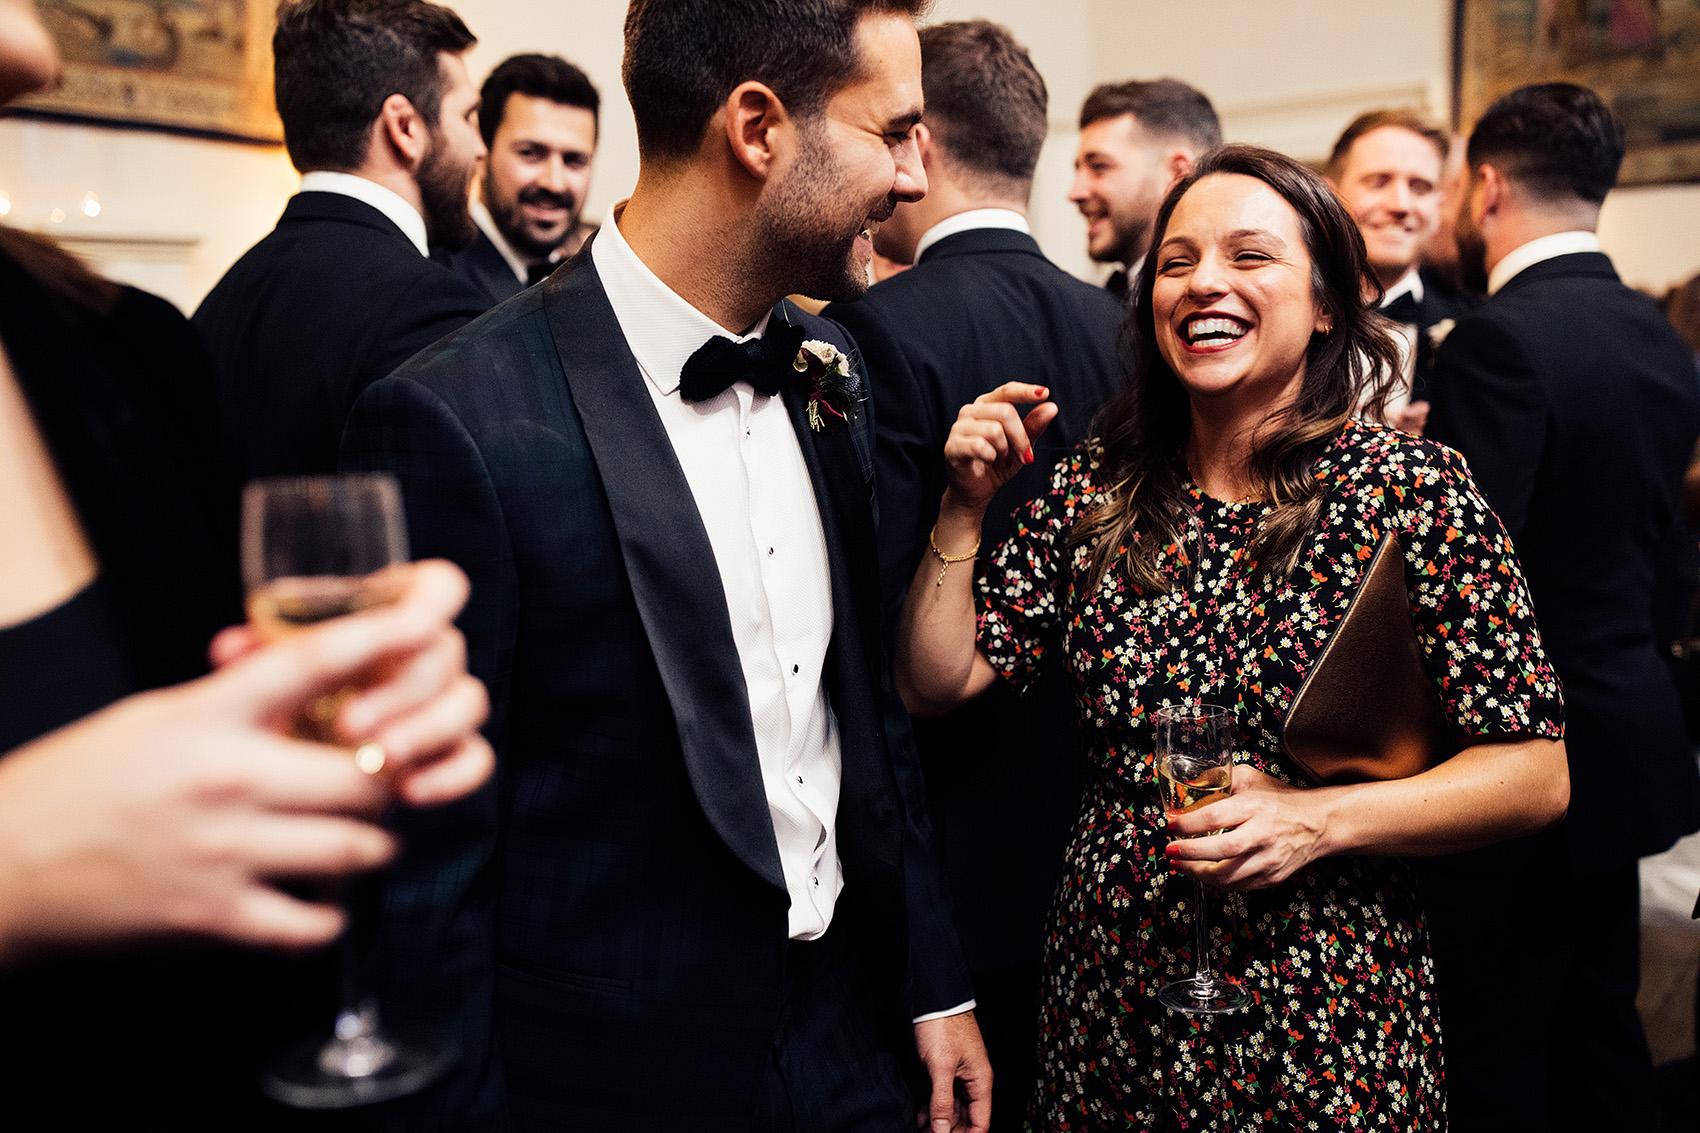 elmore-court-wedding-photography-46.jpg